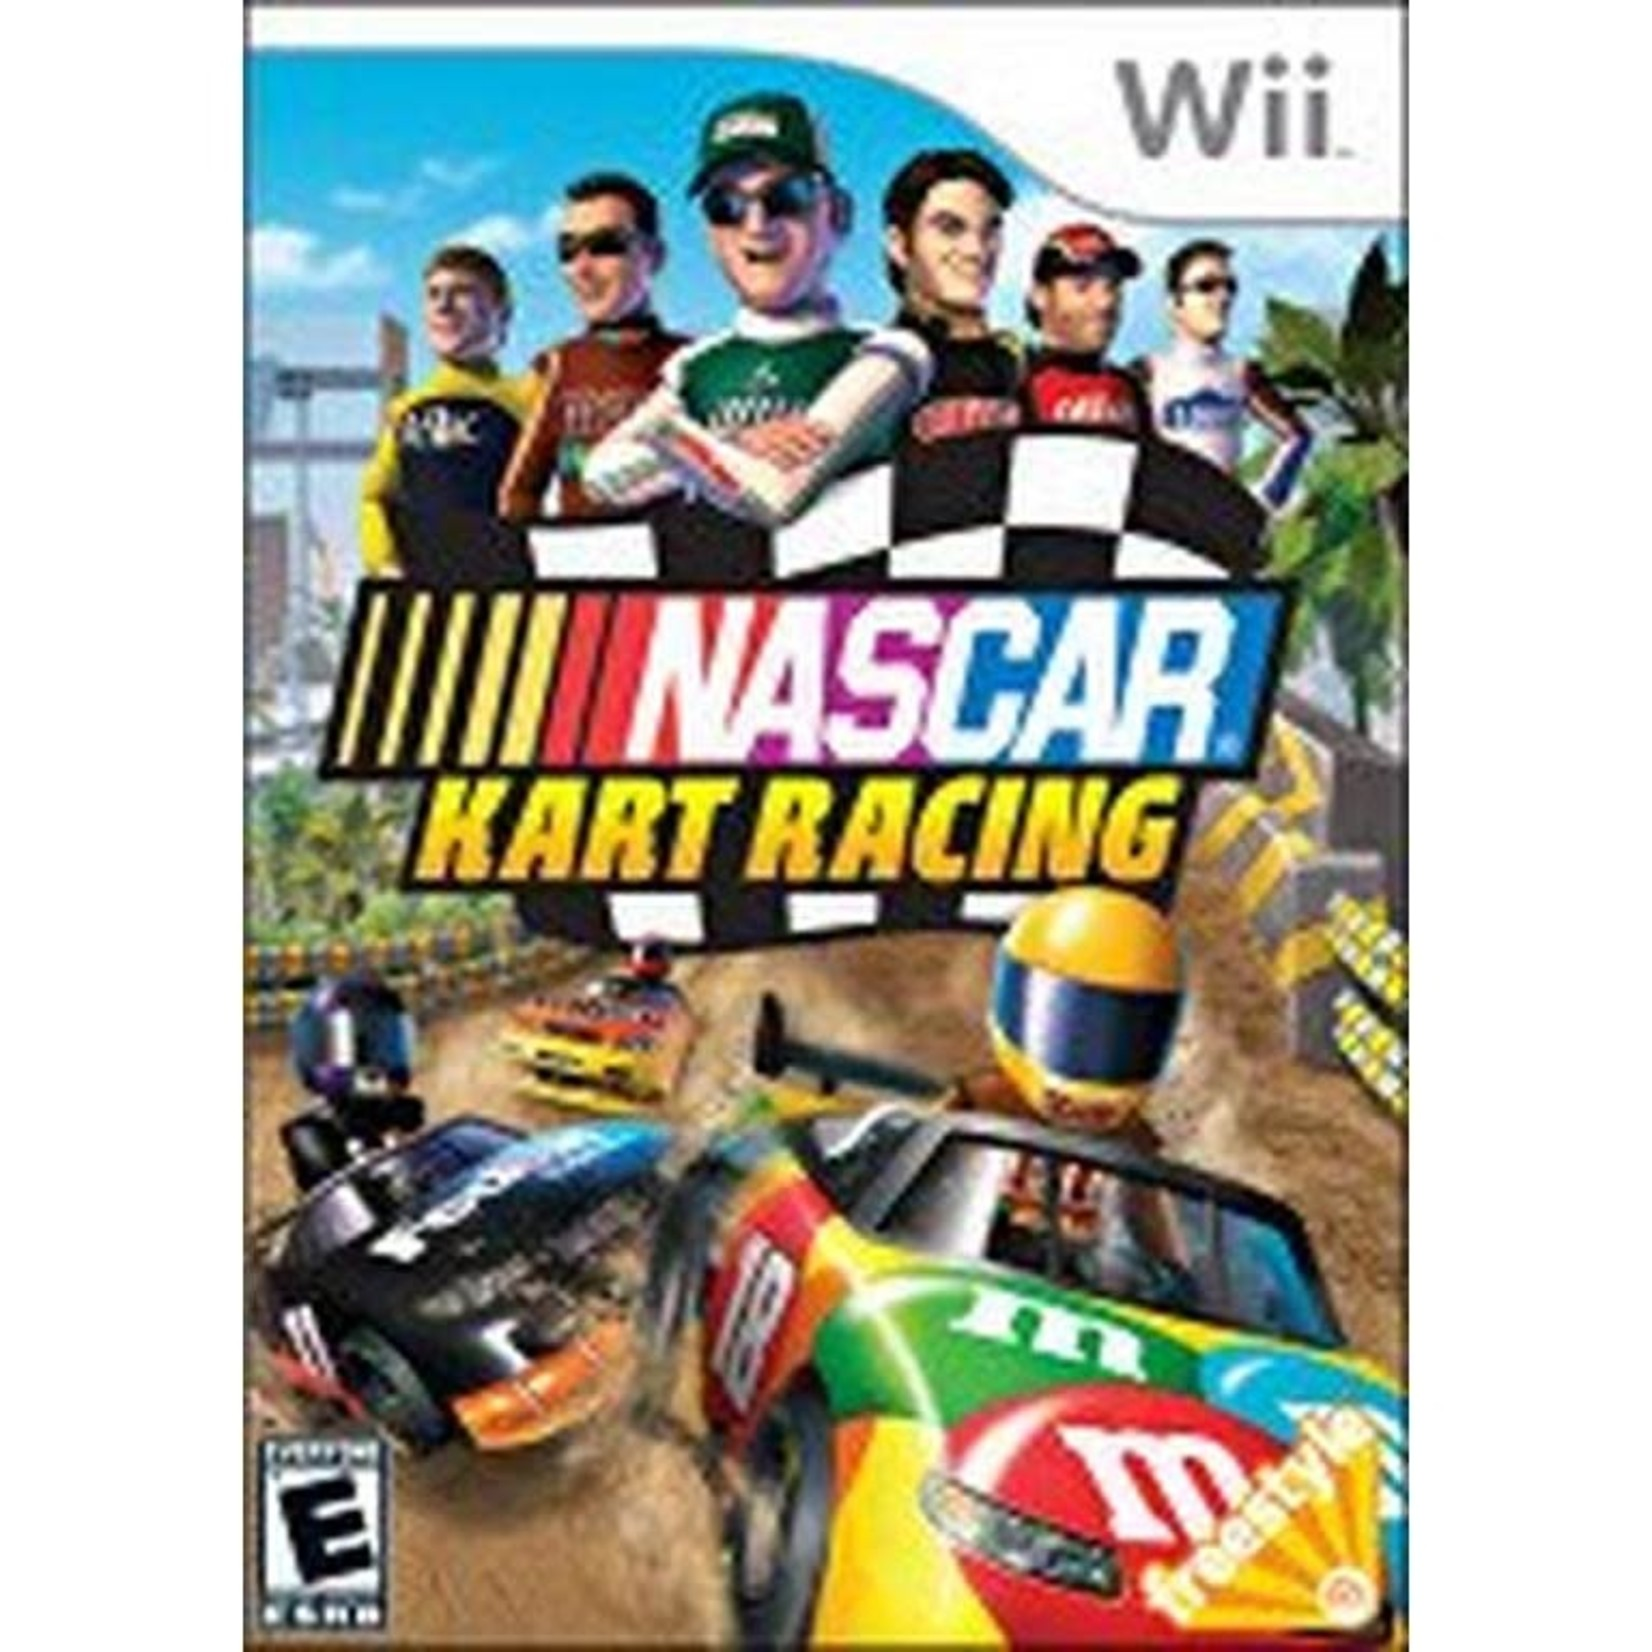 wii-Nascar Kart Racing